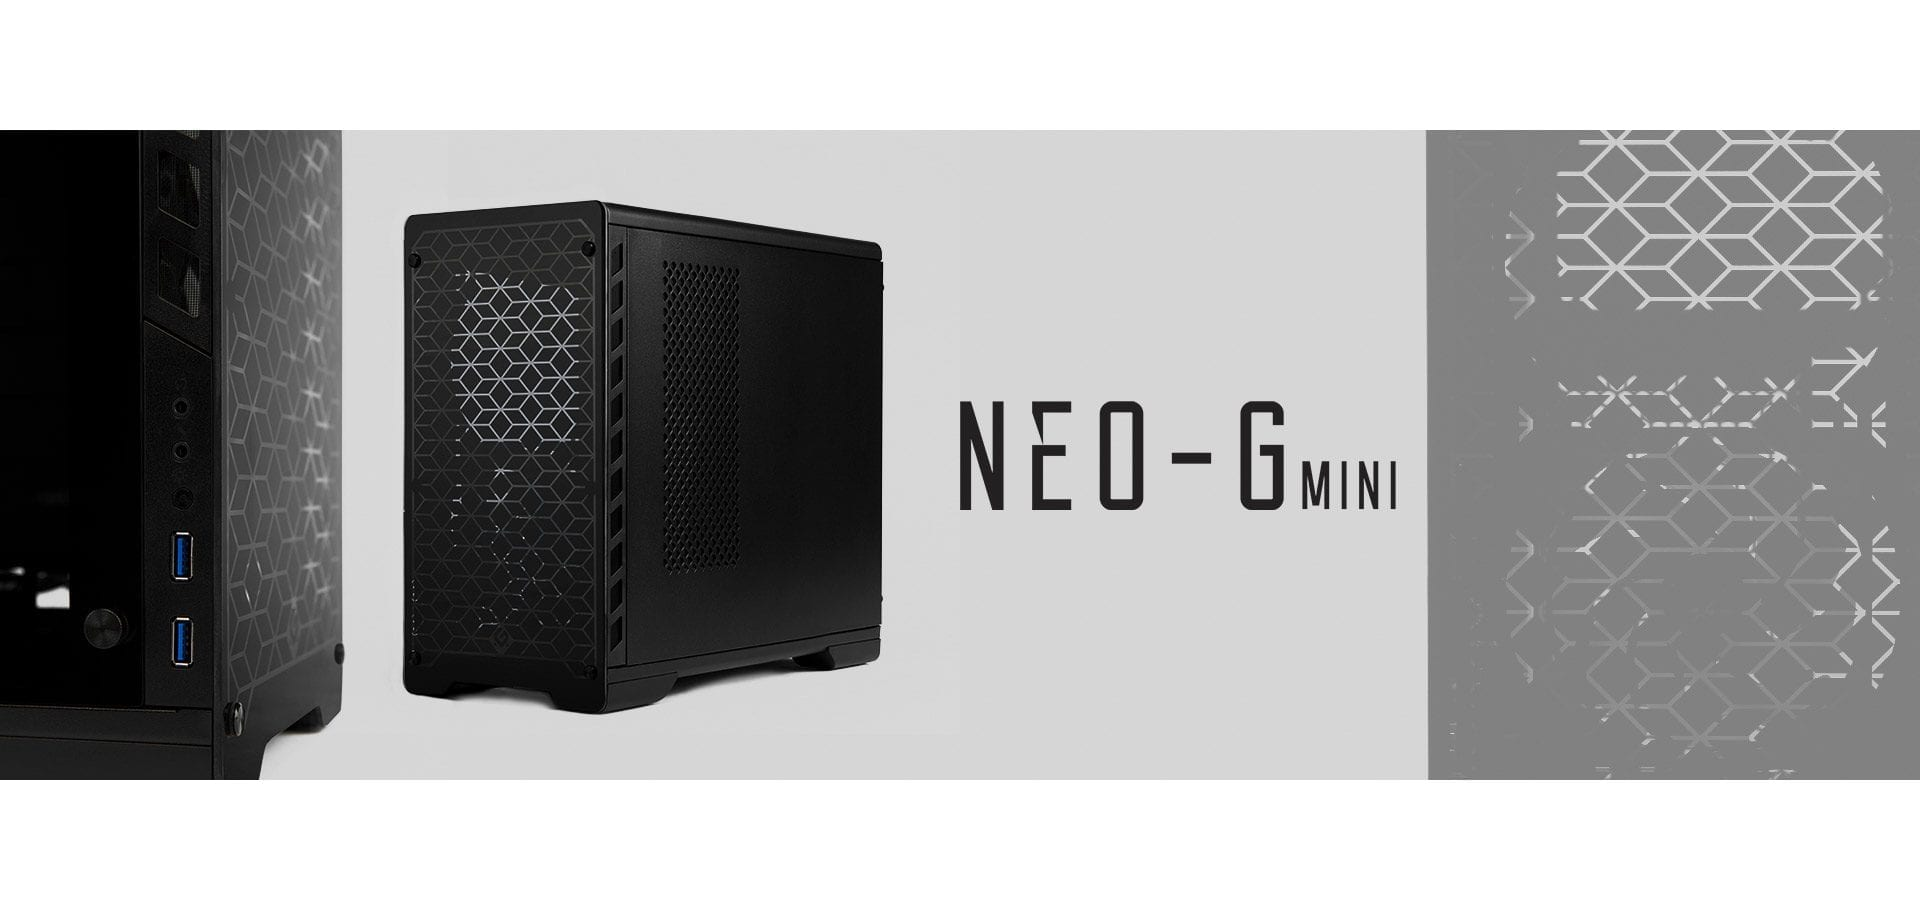 Neo_G_Miniw